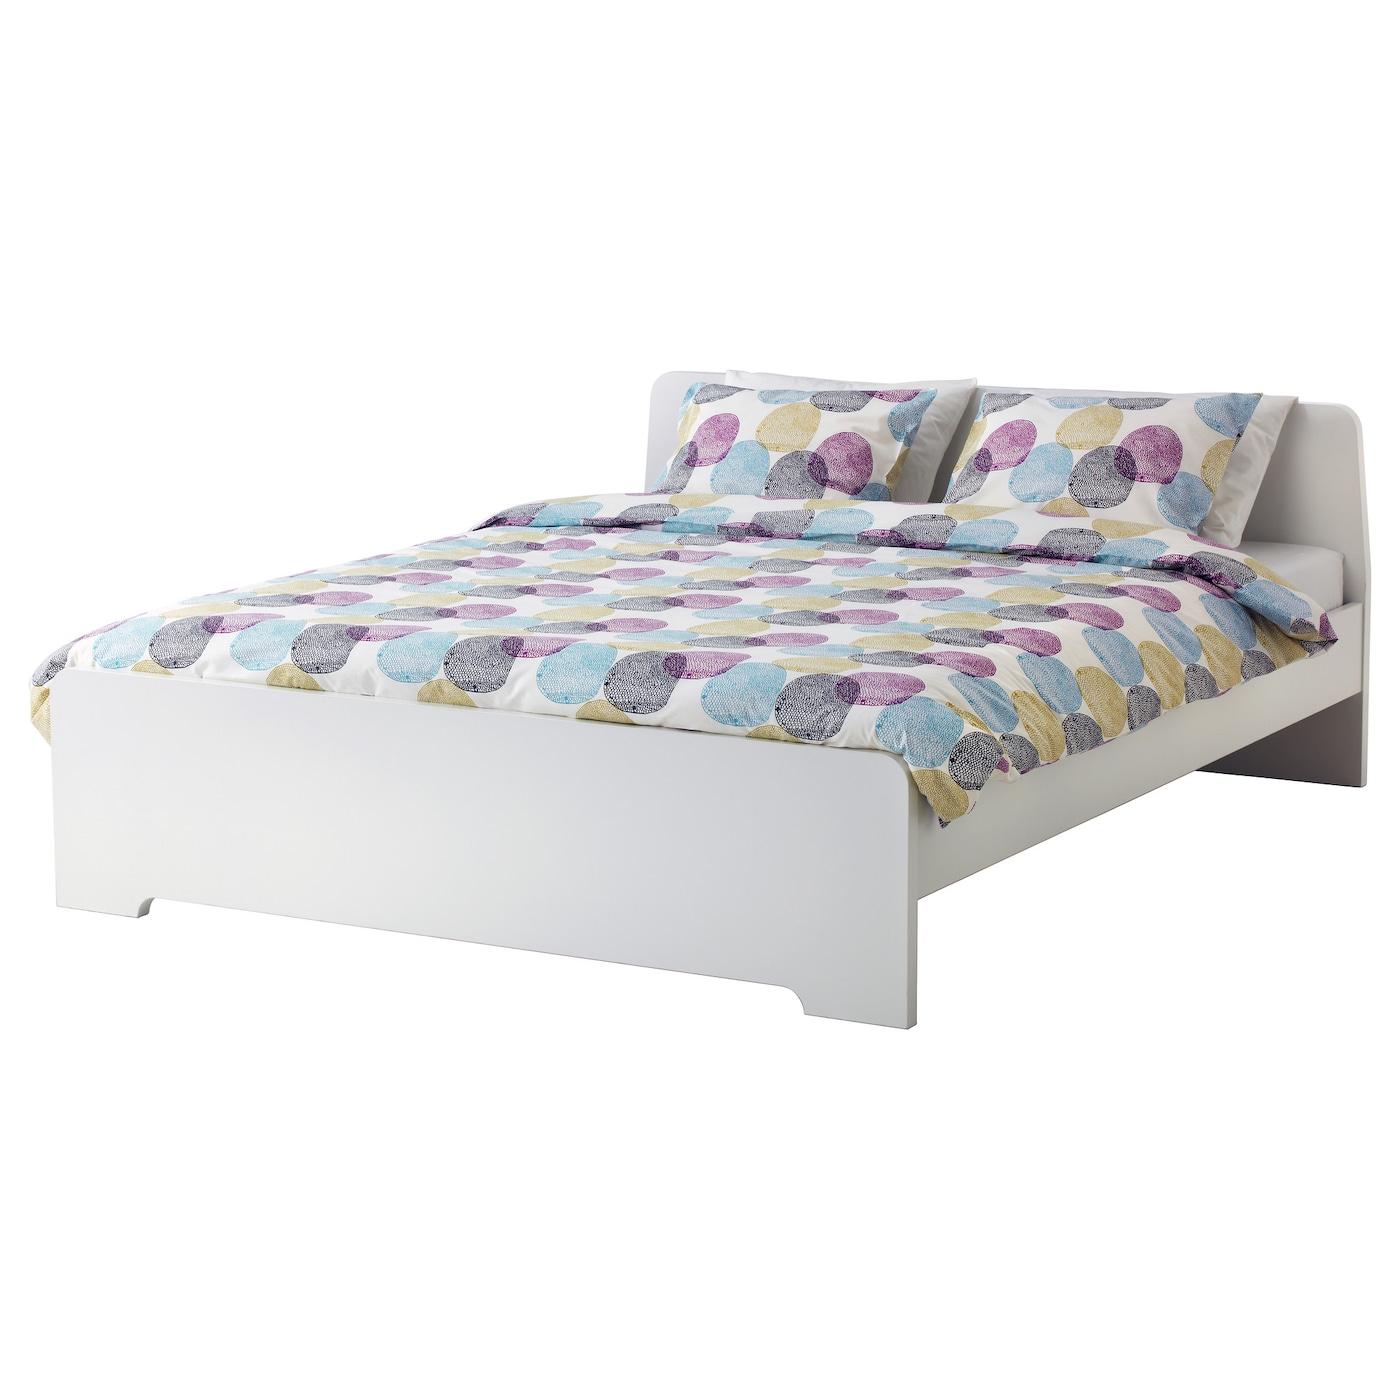 askvoll bed frame white leirsund standard double ikea. Black Bedroom Furniture Sets. Home Design Ideas